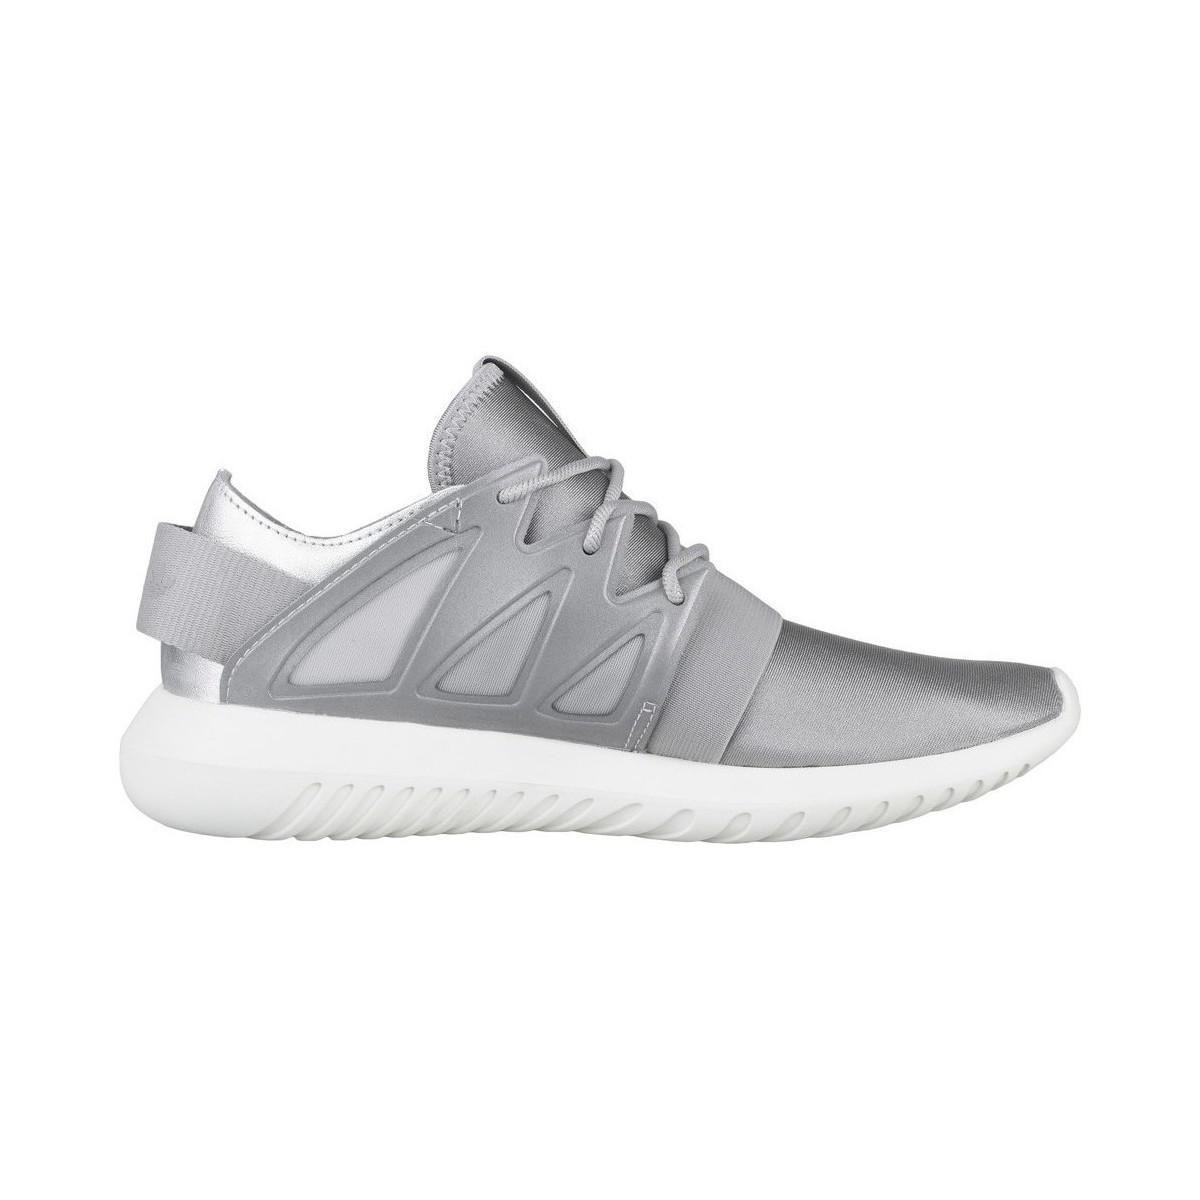 adidas Tubular Viral W Gymnastics Shoes in Metallic Silver (Metallic)